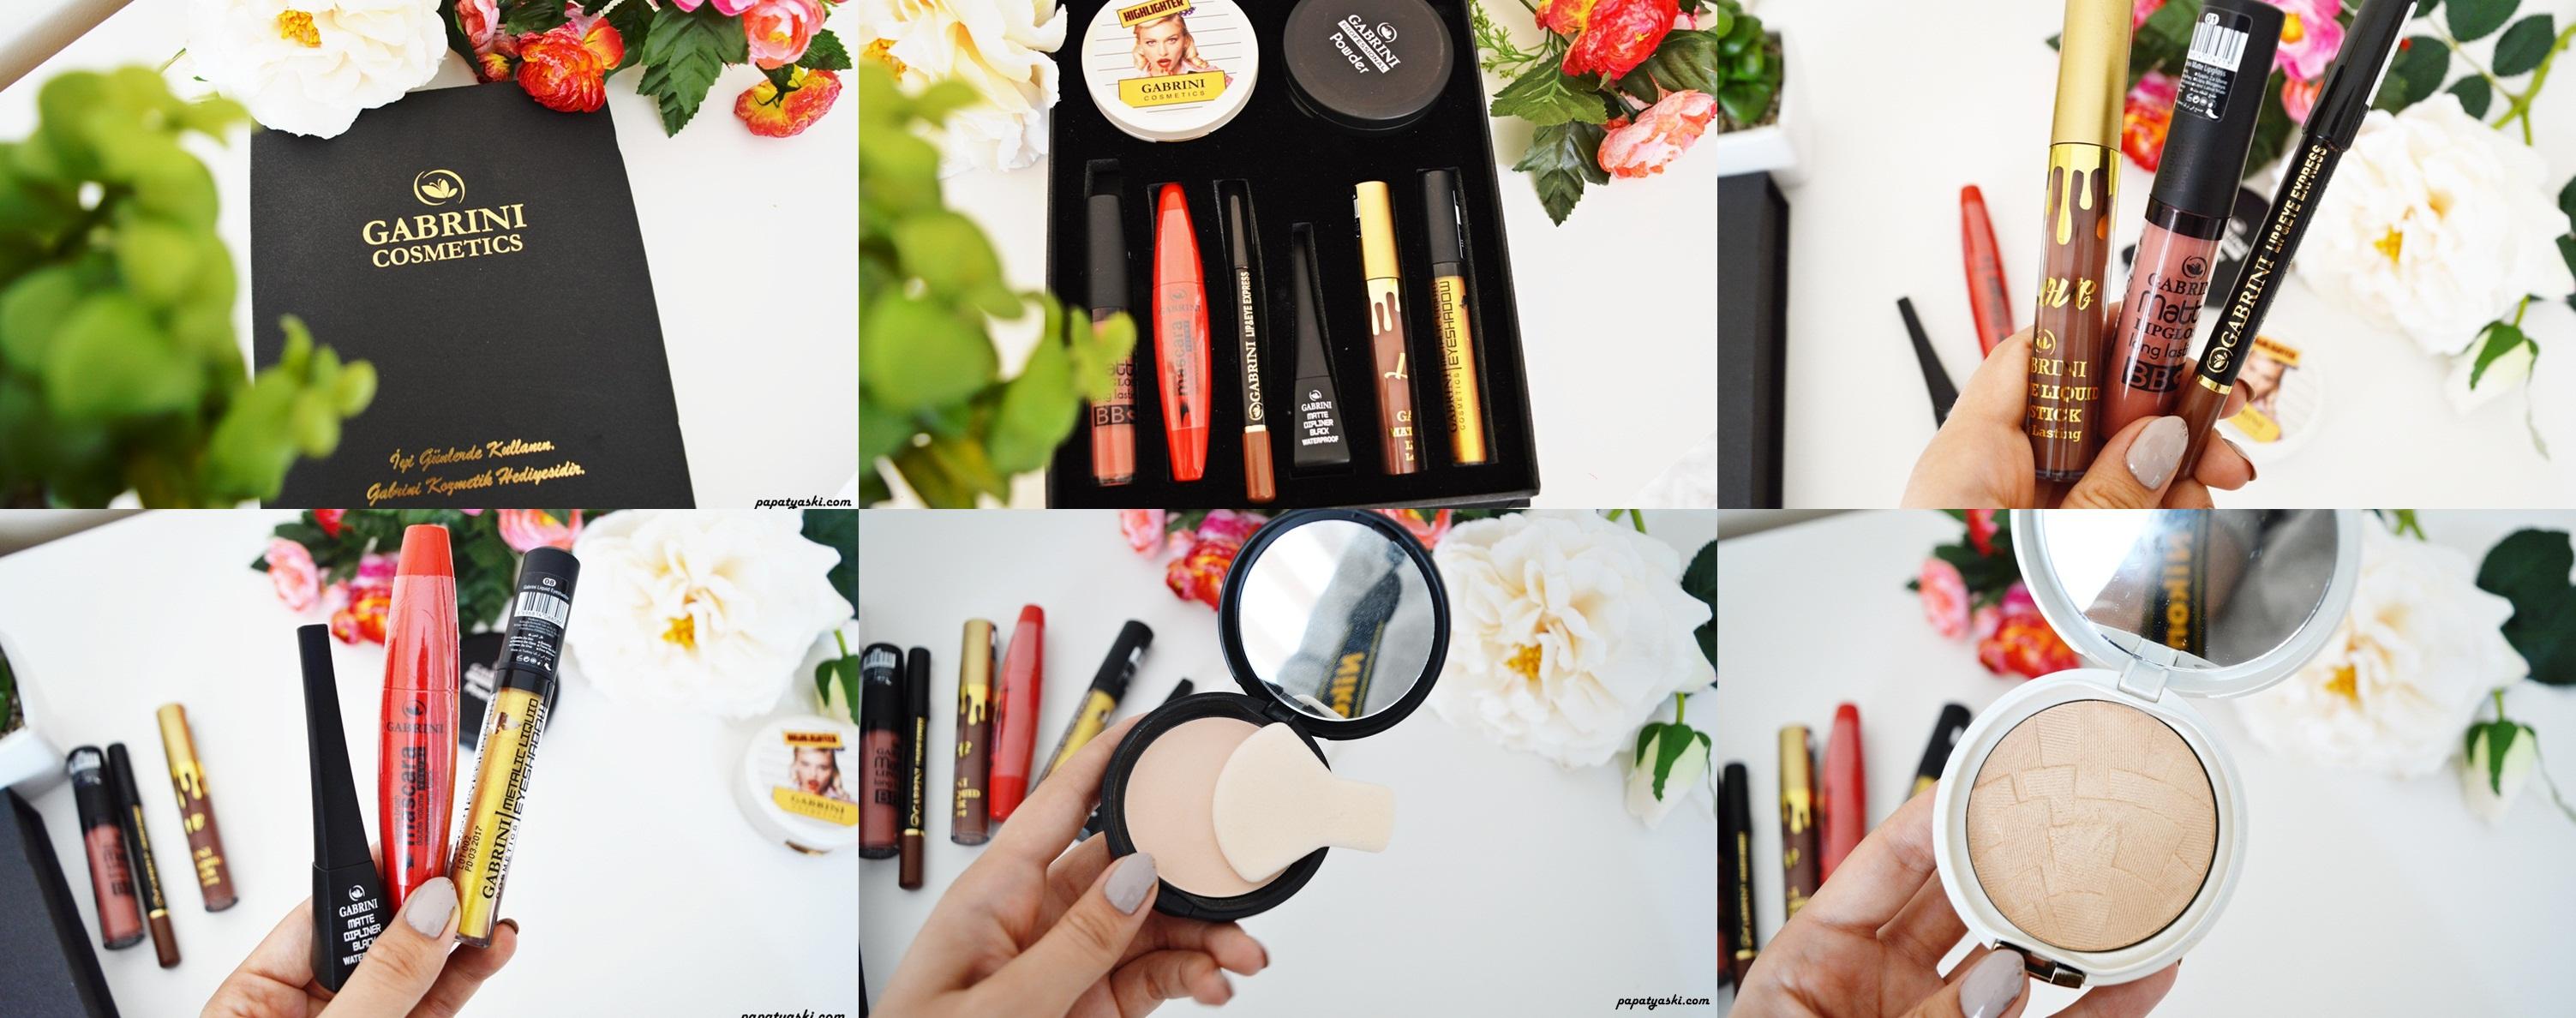 gabrini-kozmetik-blog-yorumlar